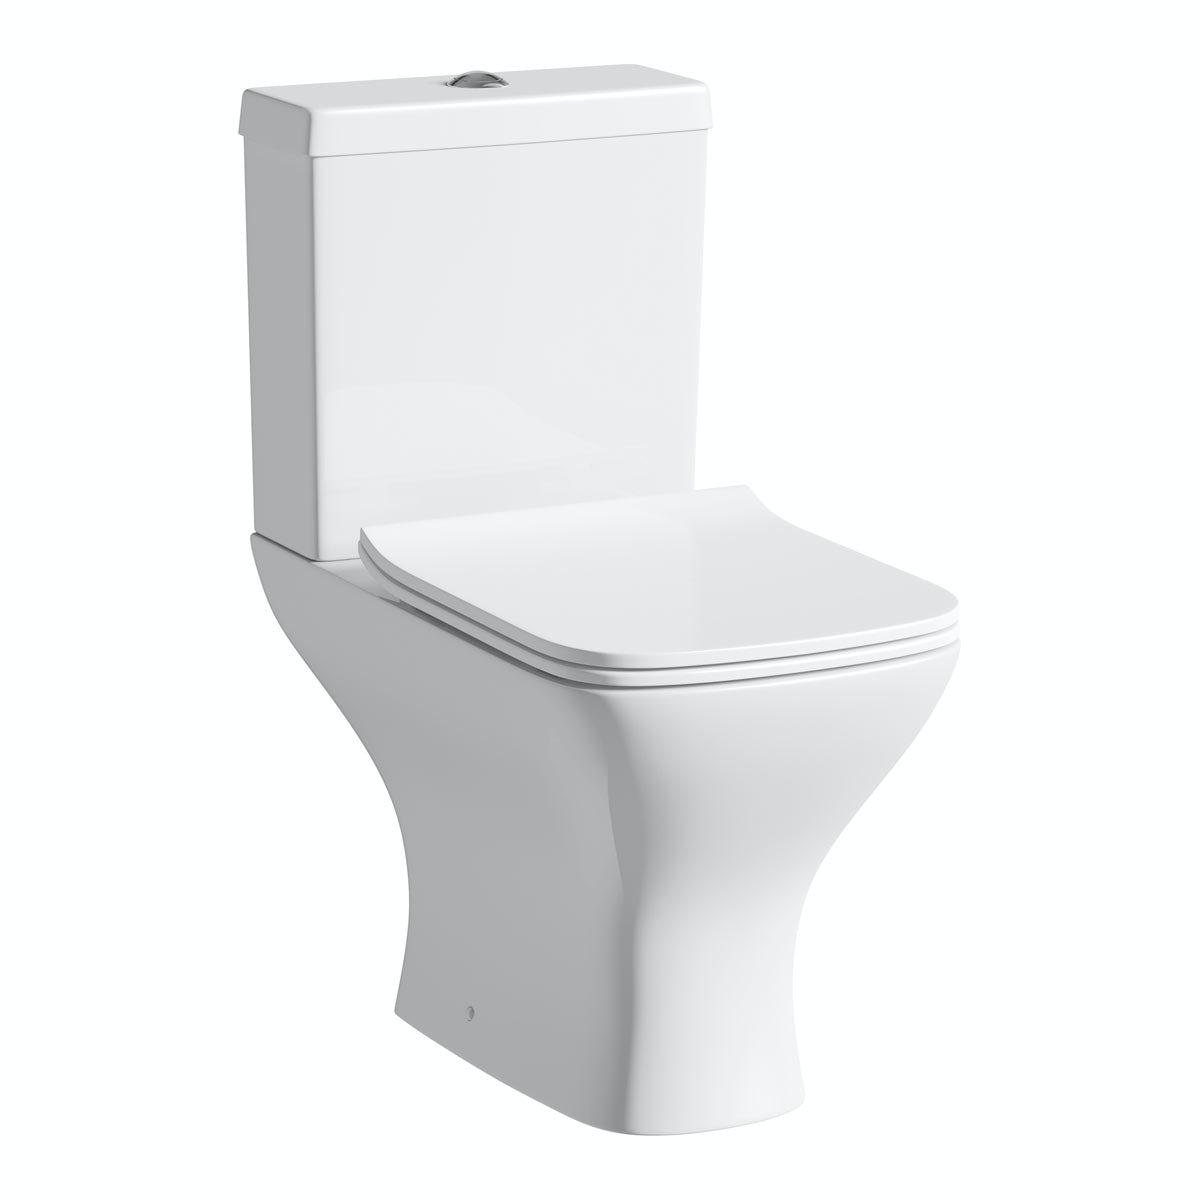 Derwent Square Close Coupled Toilet